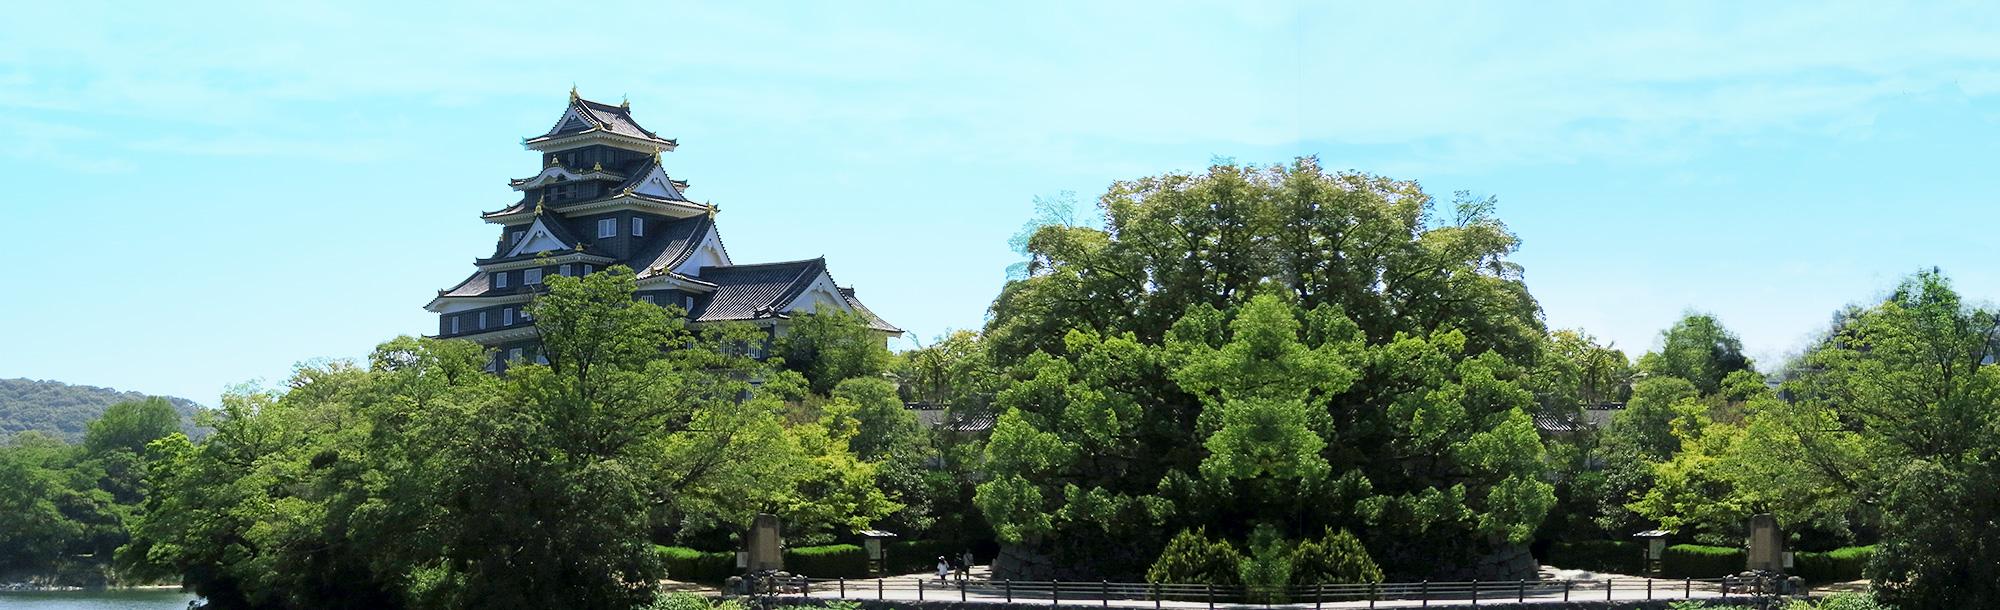 Travel in Okayama